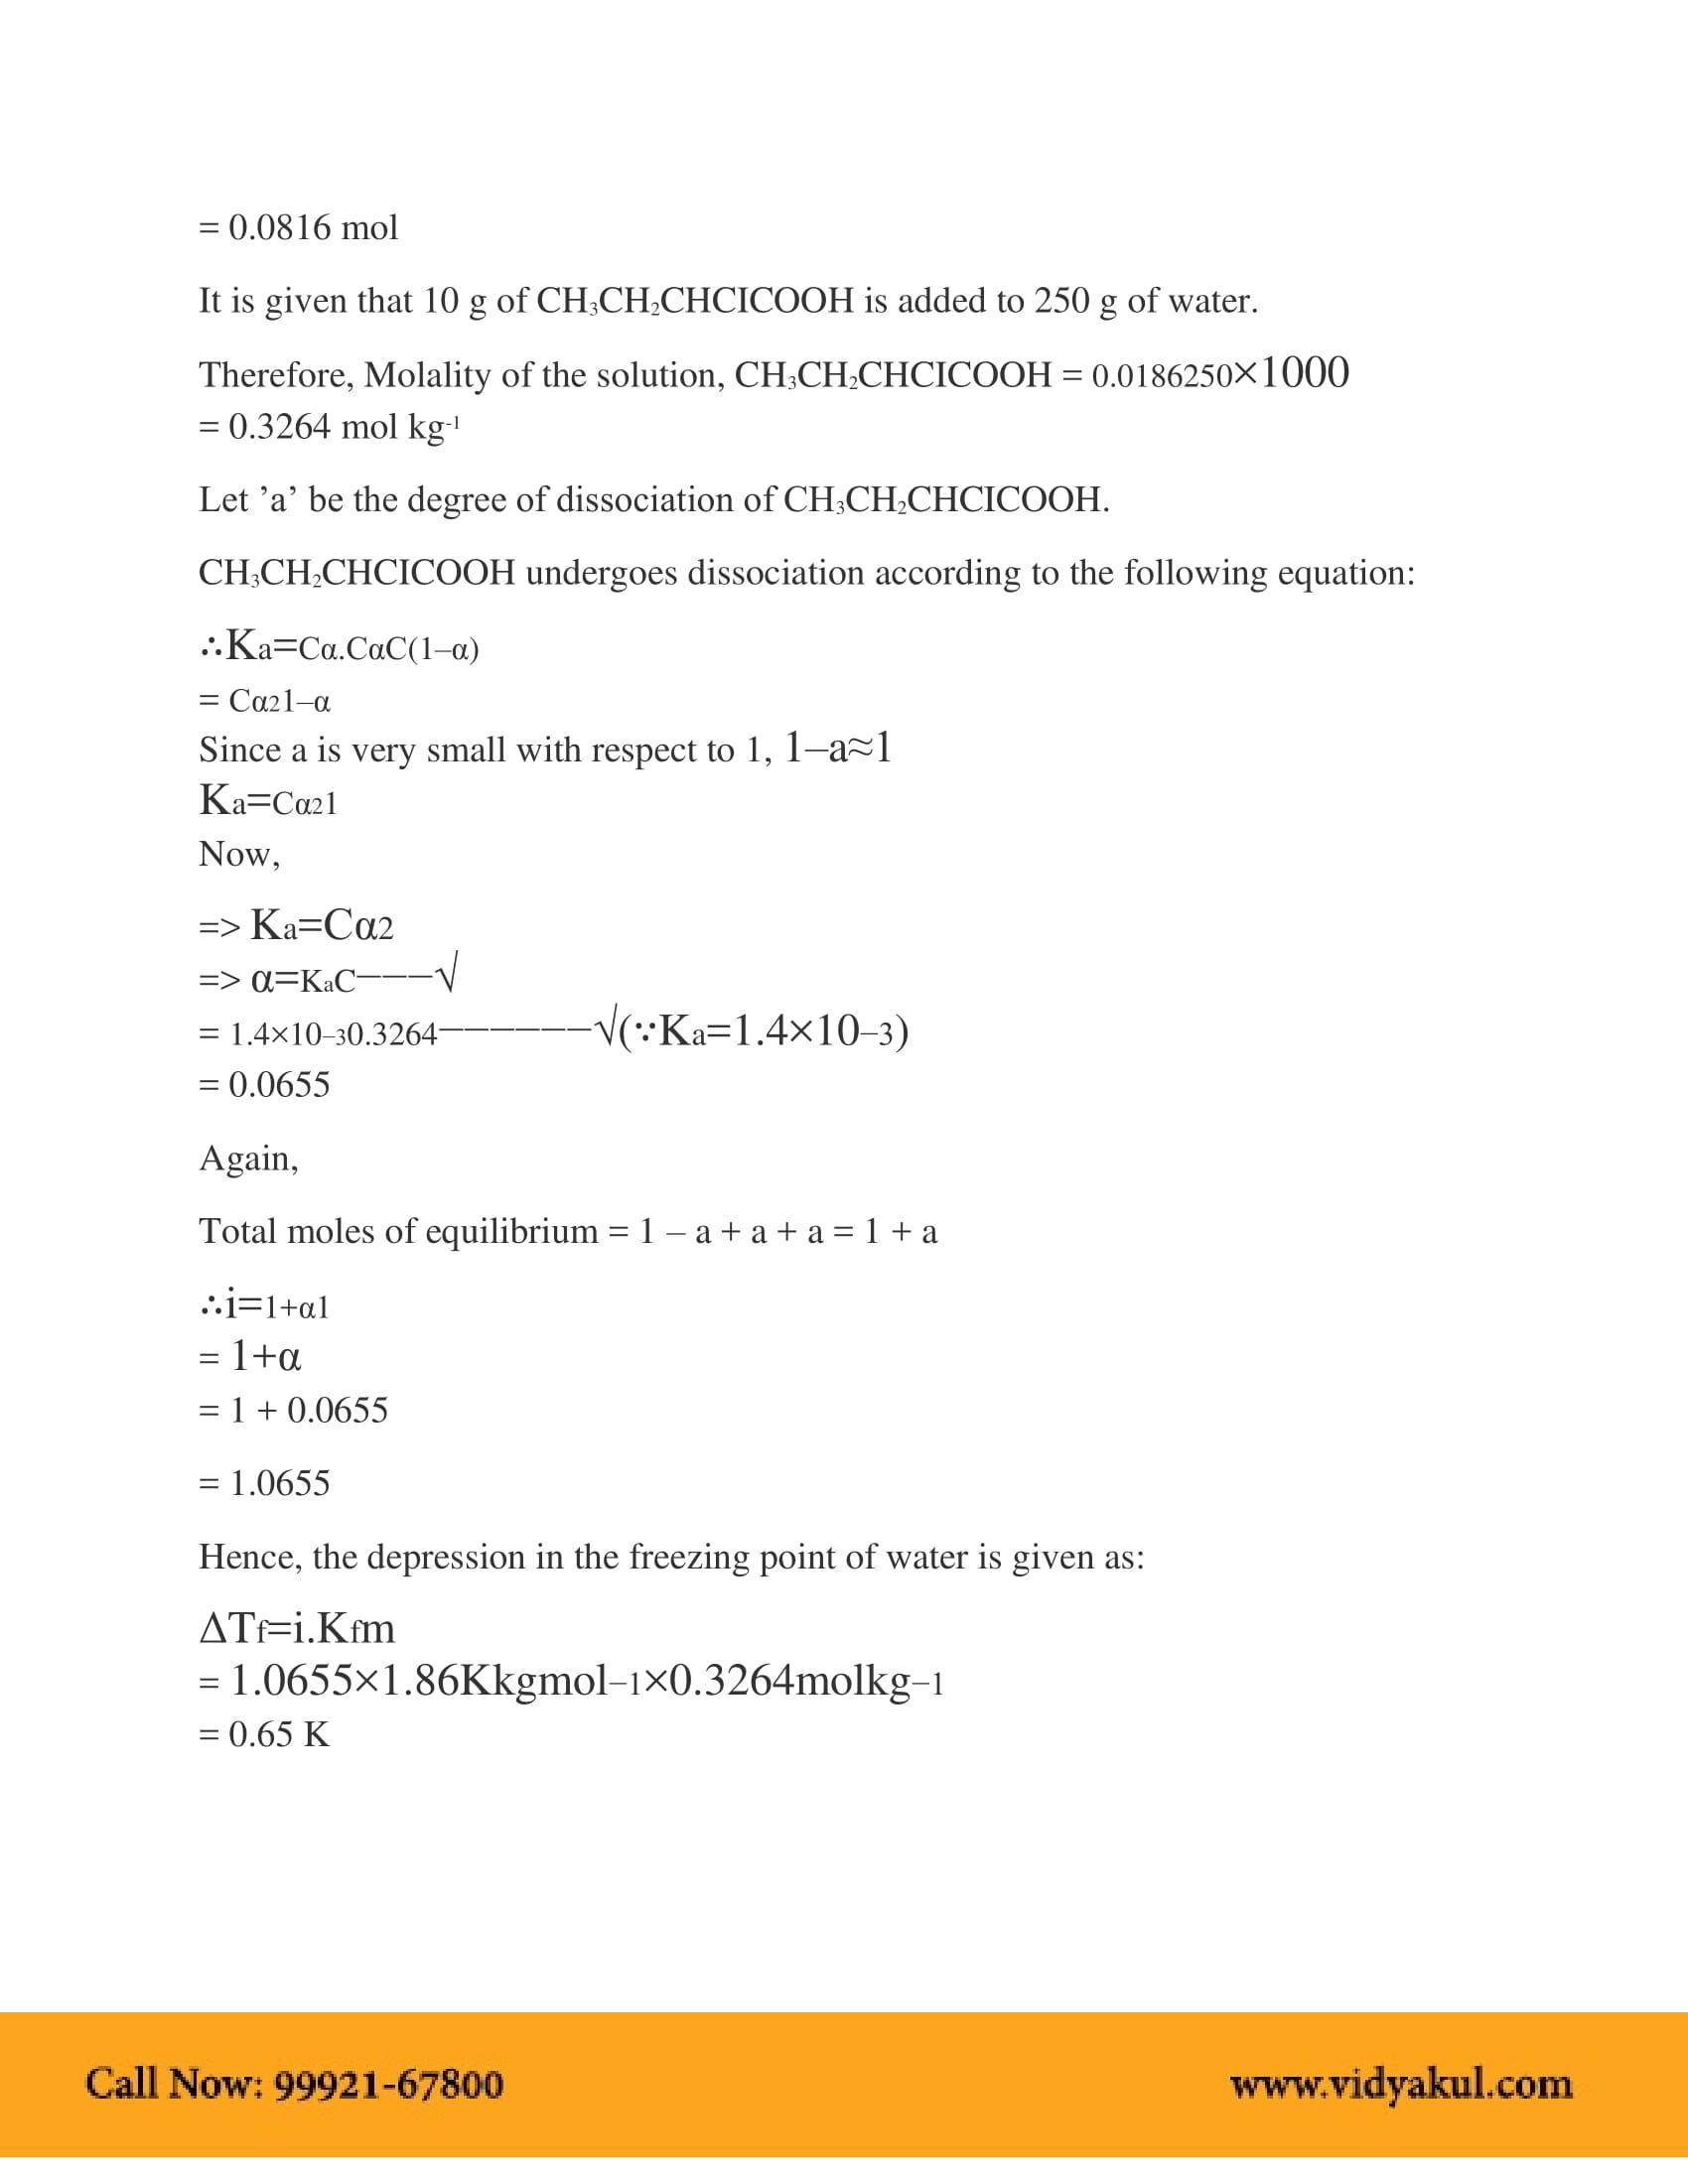 Ncert Solution Class 12 Chemistry Chapter 2 Vidyakul